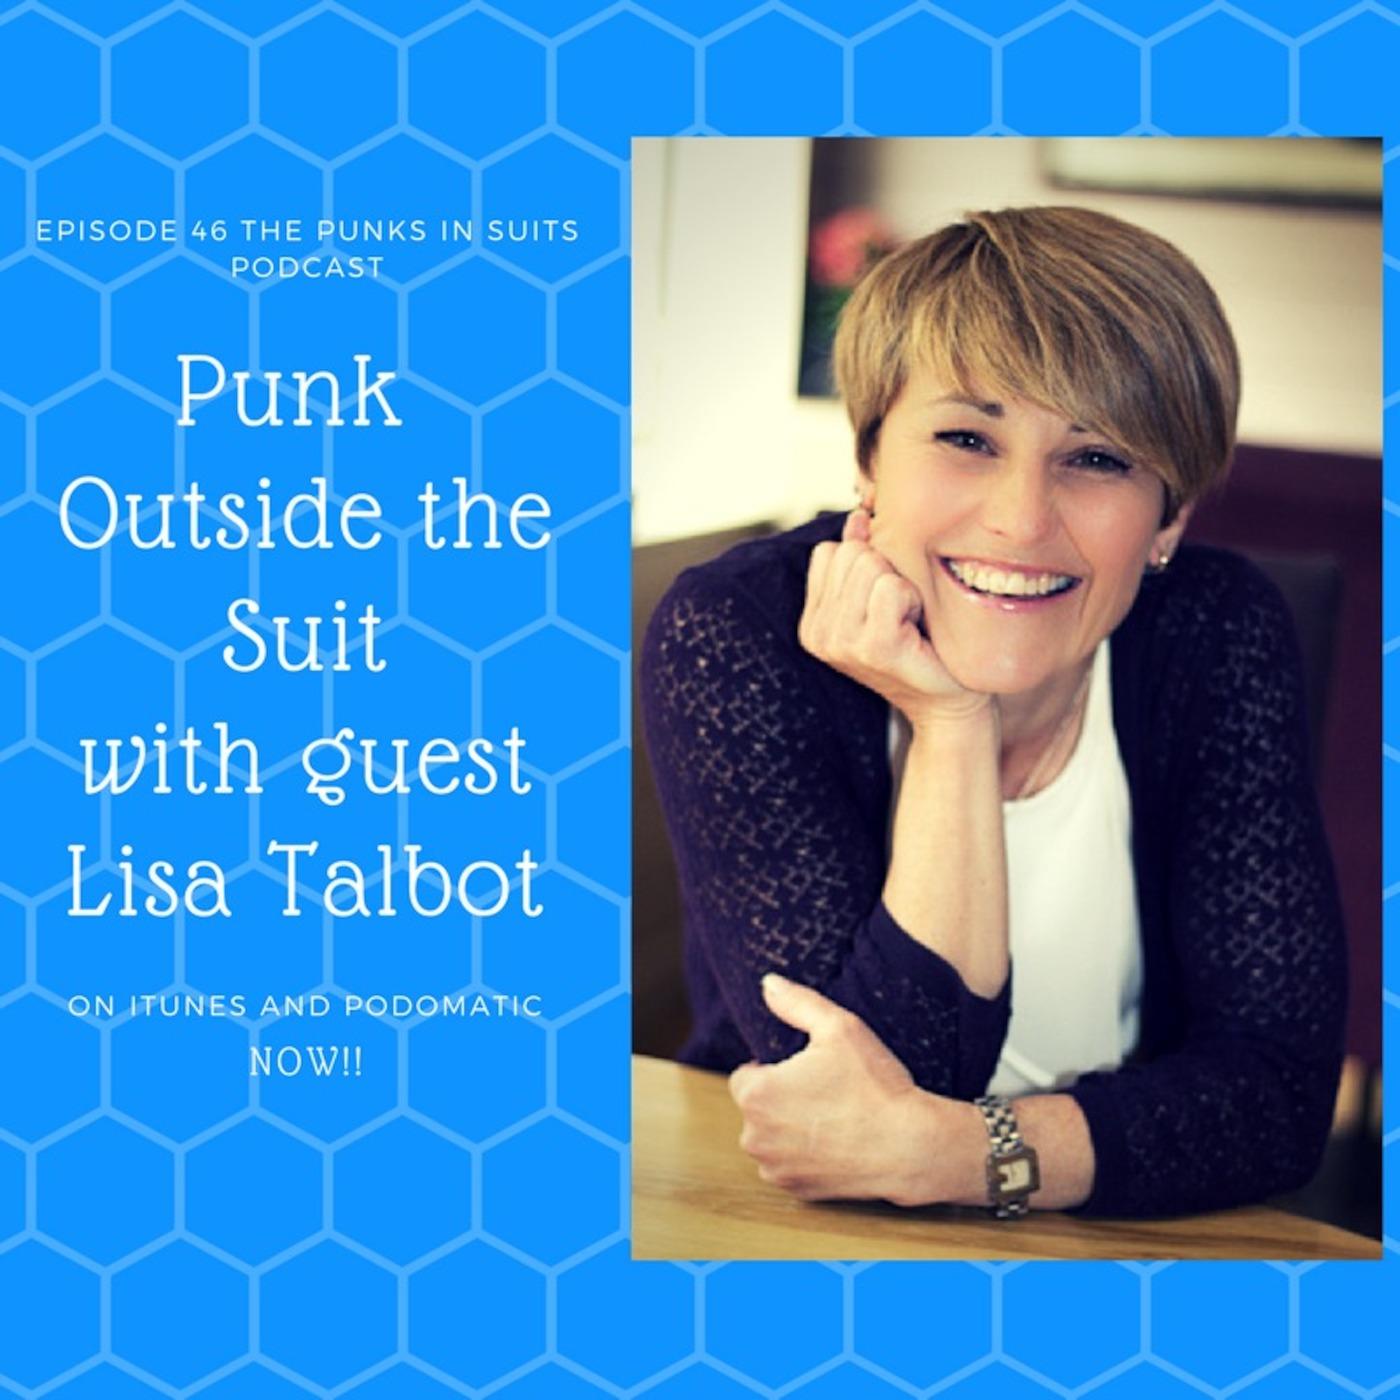 Episode 46: Punk Outside the Suit